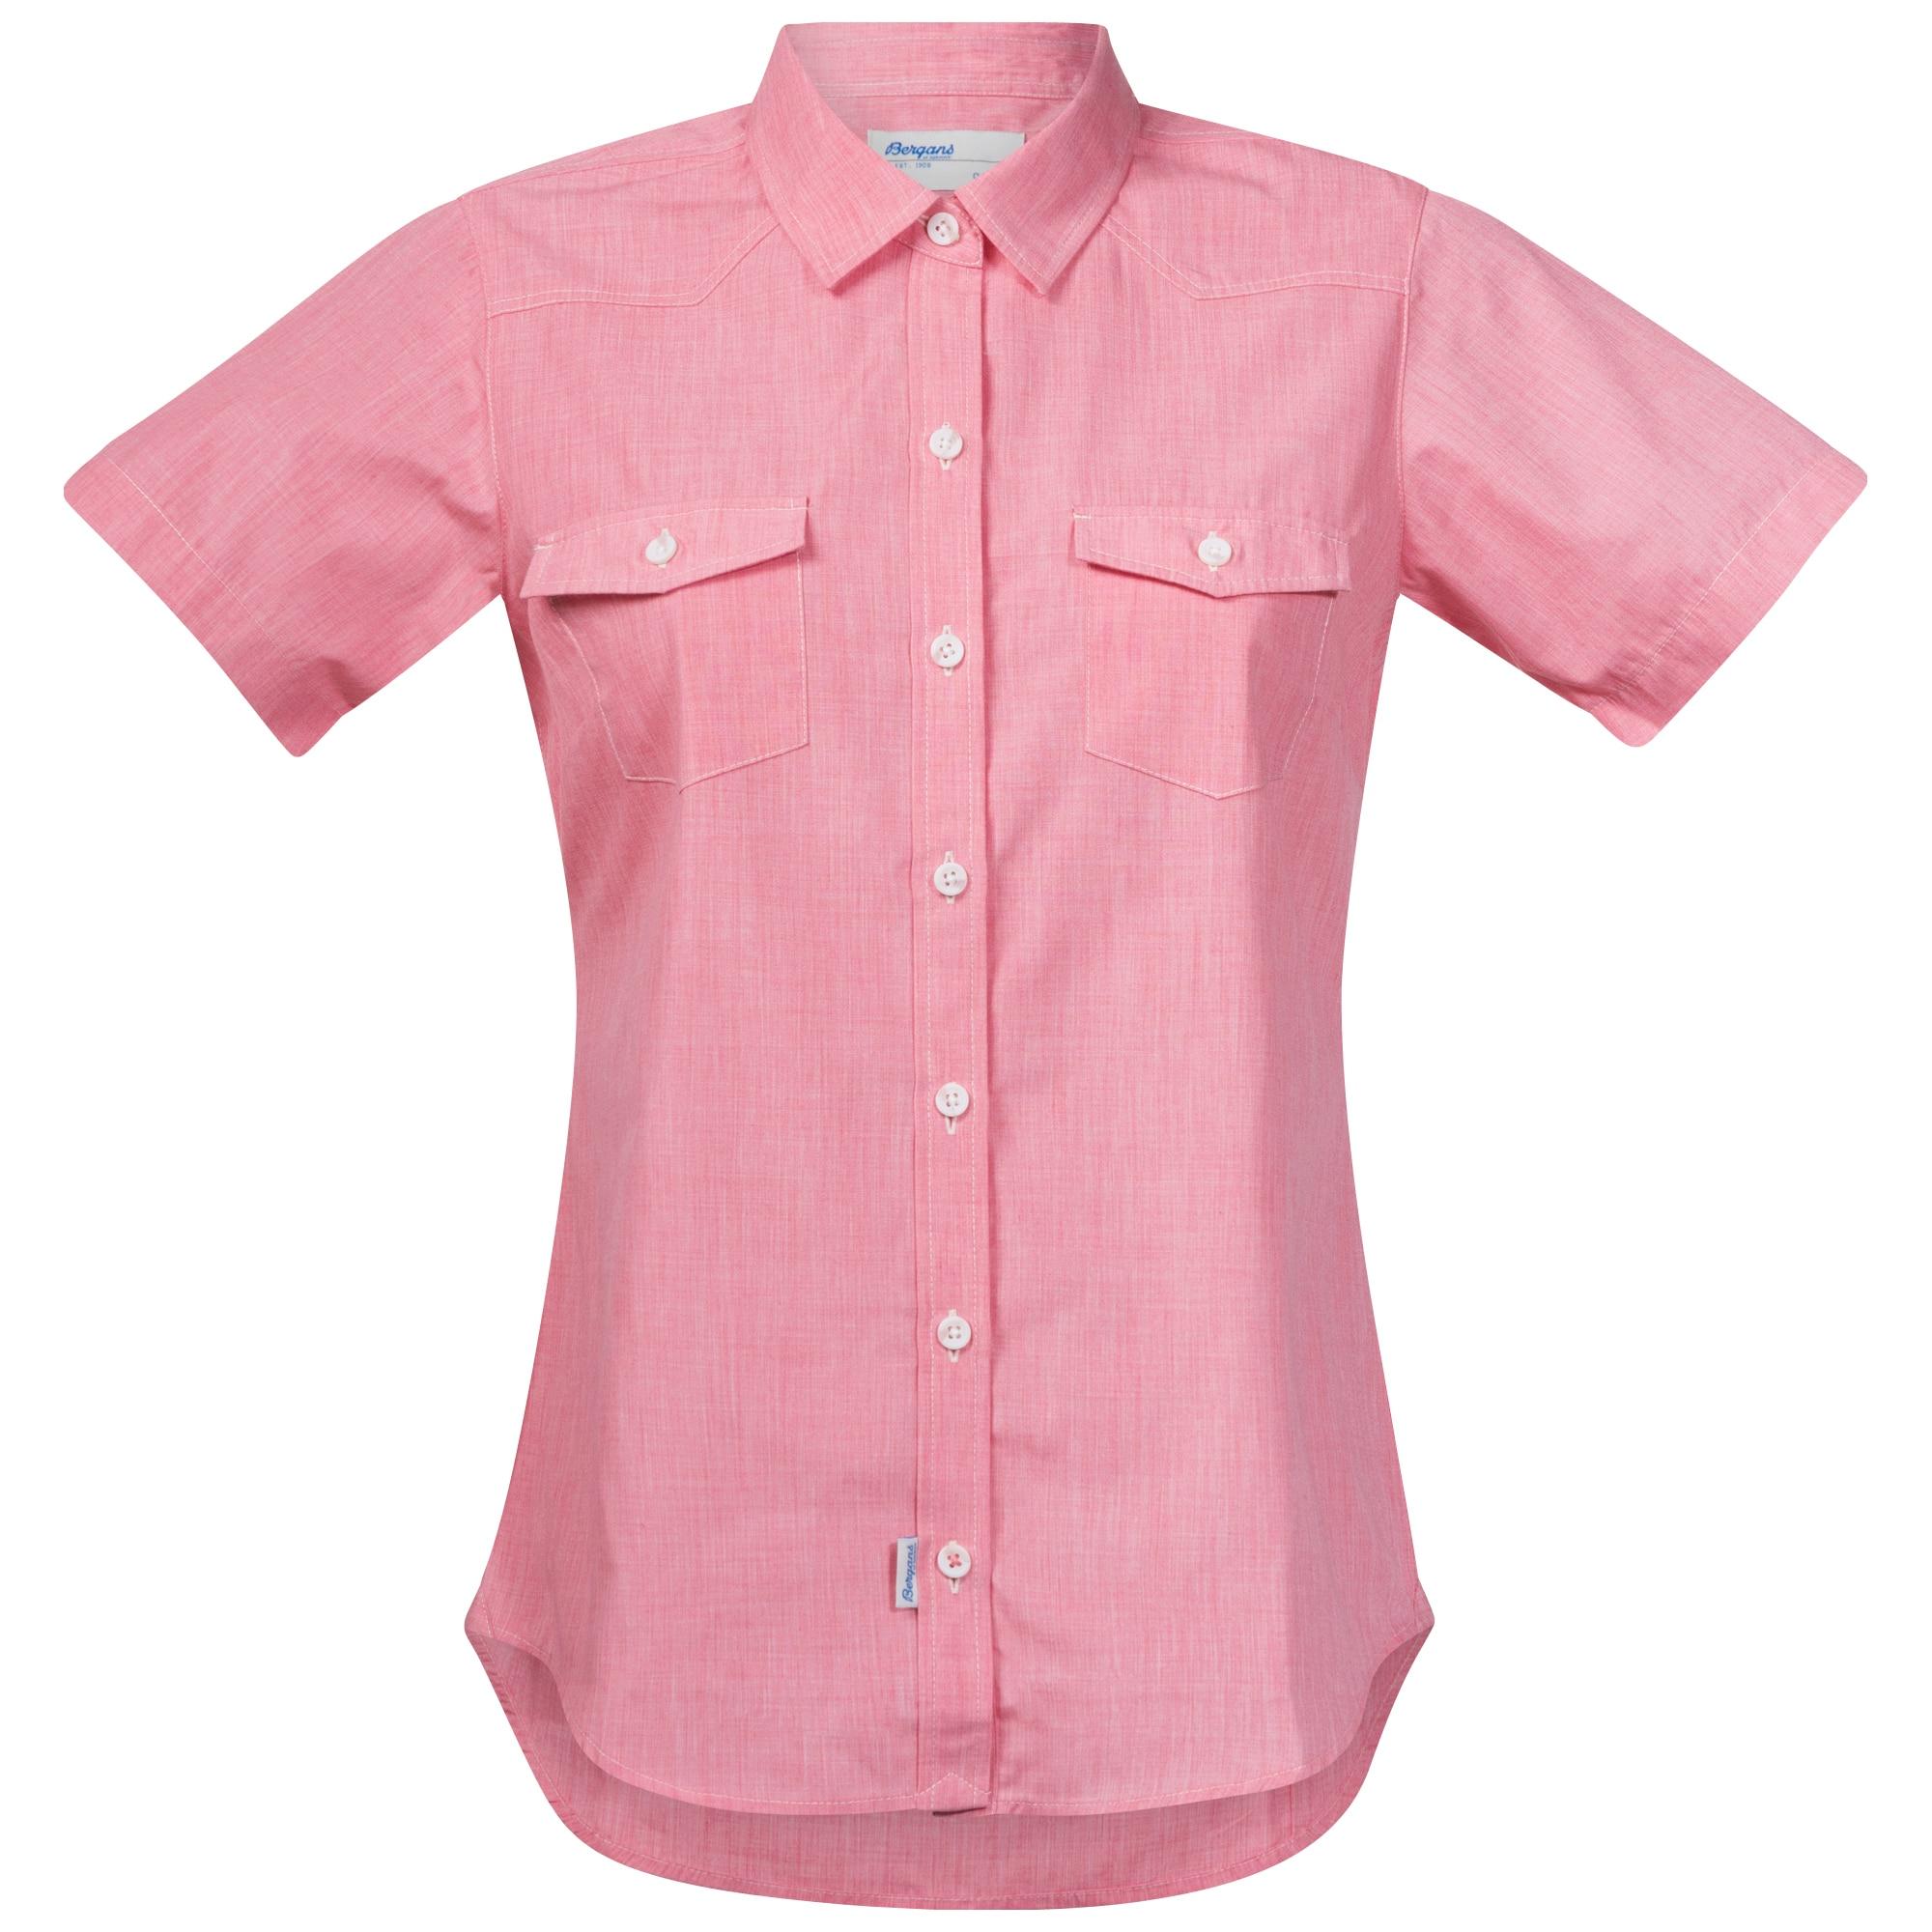 Justøy Lady Shirt Short Sleeve